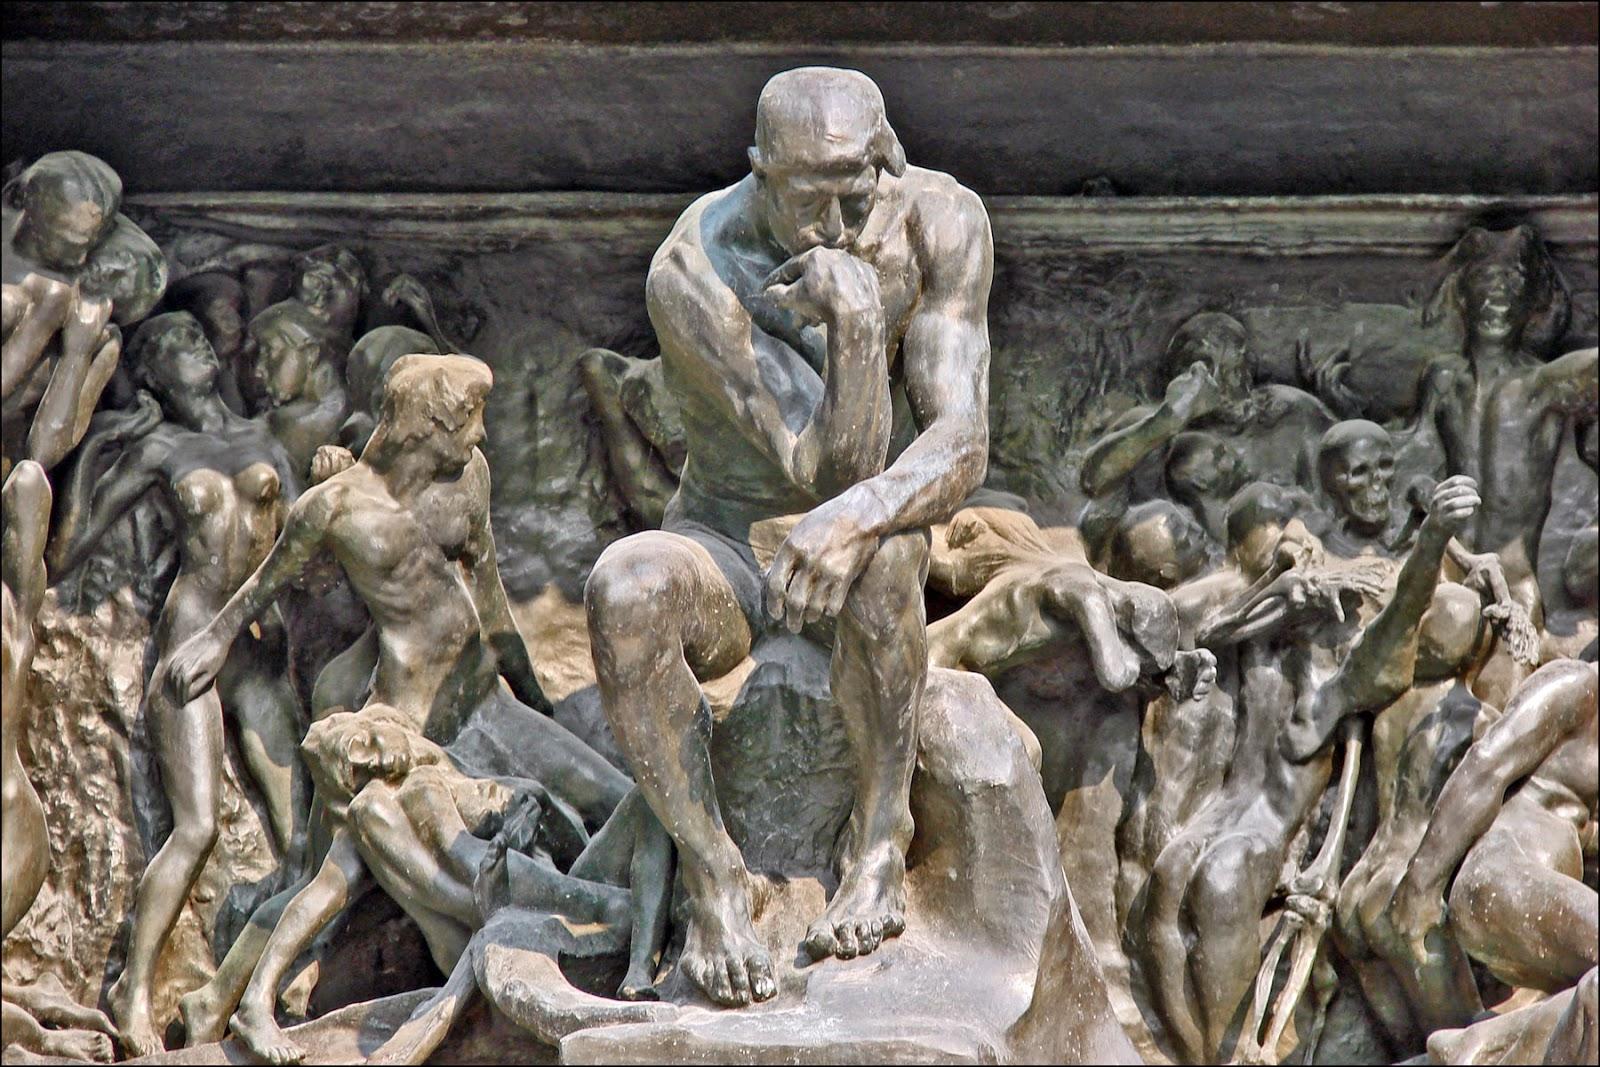 http://upload.wikimedia.org/wikipedia/commons/9/96/Le_penseur_de_la_Porte_de_lEnfer_%28mus%C3%A9e_Rodin%29_%284528252054%29.jpg